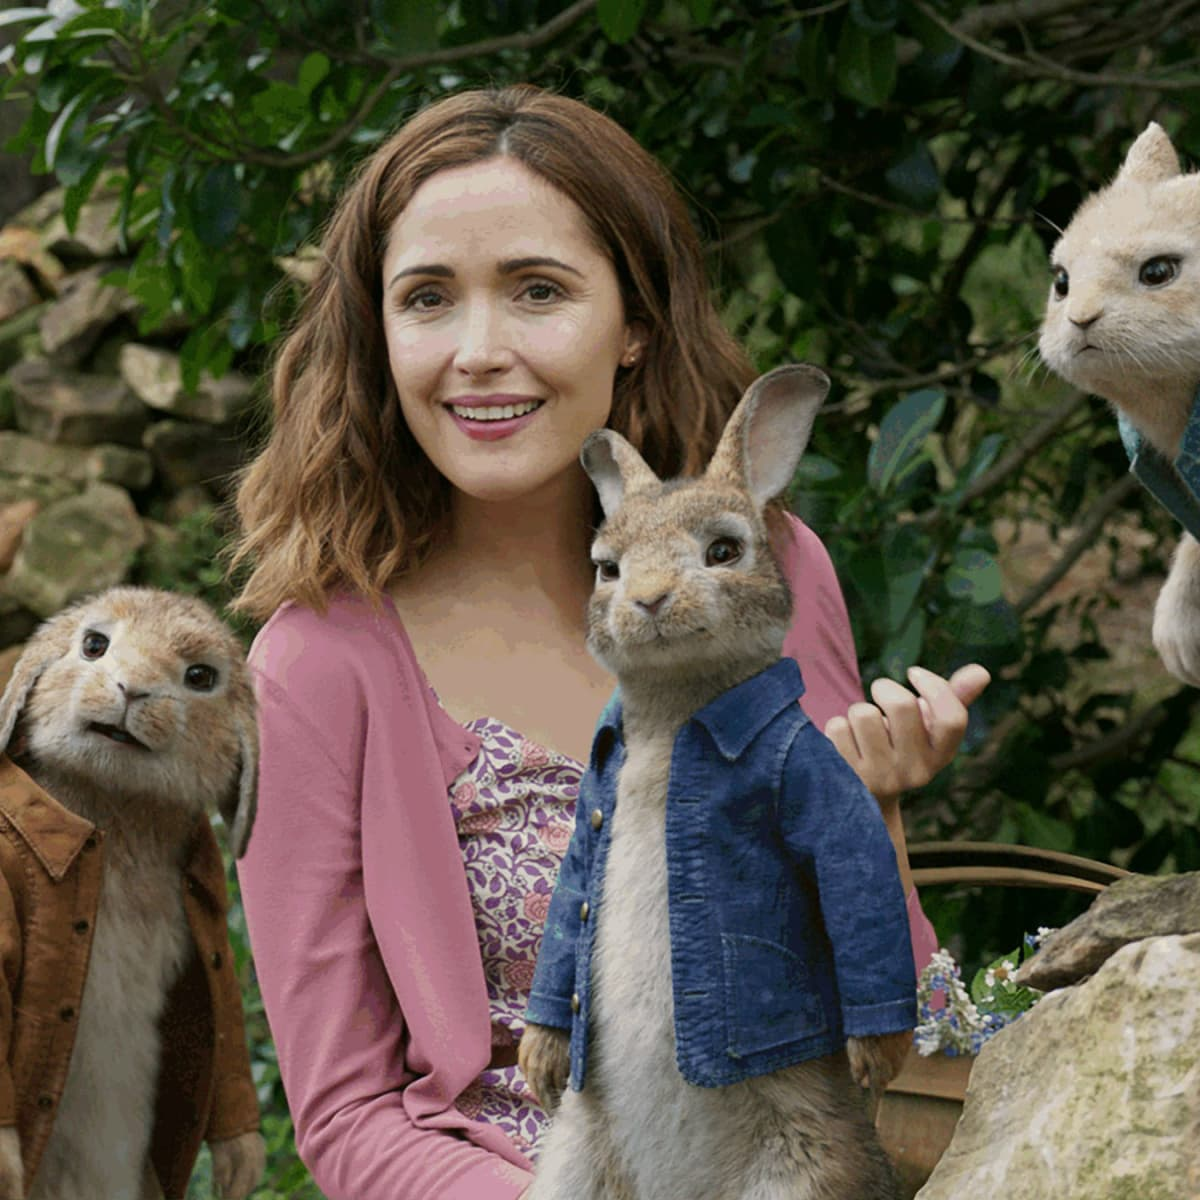 Rose Byrne in Peter Rabbit